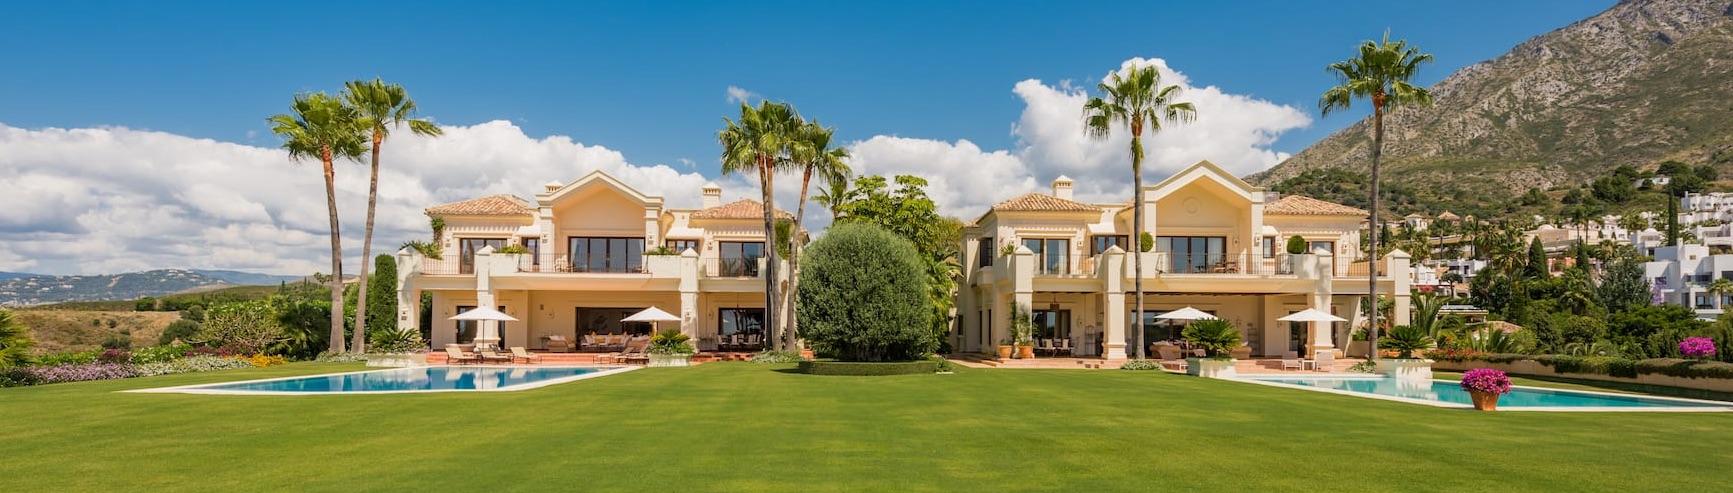 Villas in Marbella Hill Club, Golden Mile